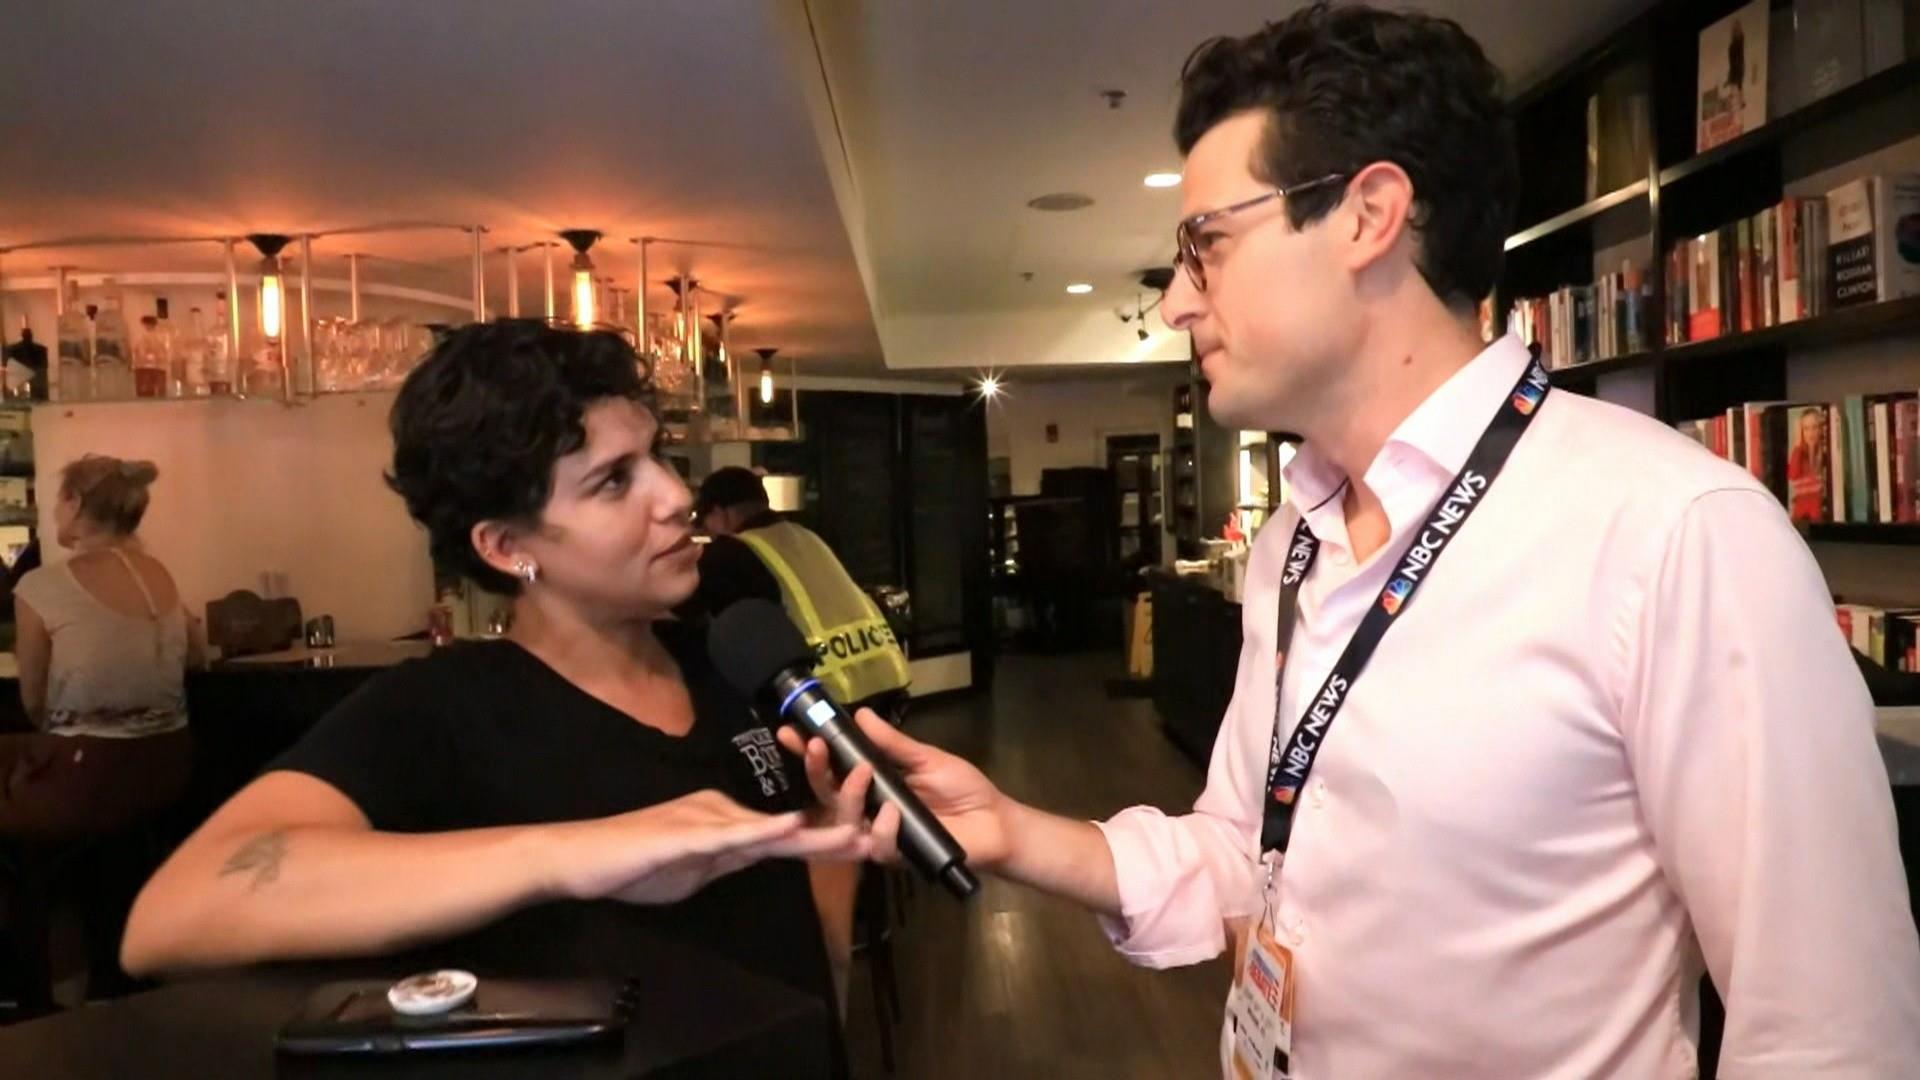 Miami voters react to Democrats' 1st primary debate